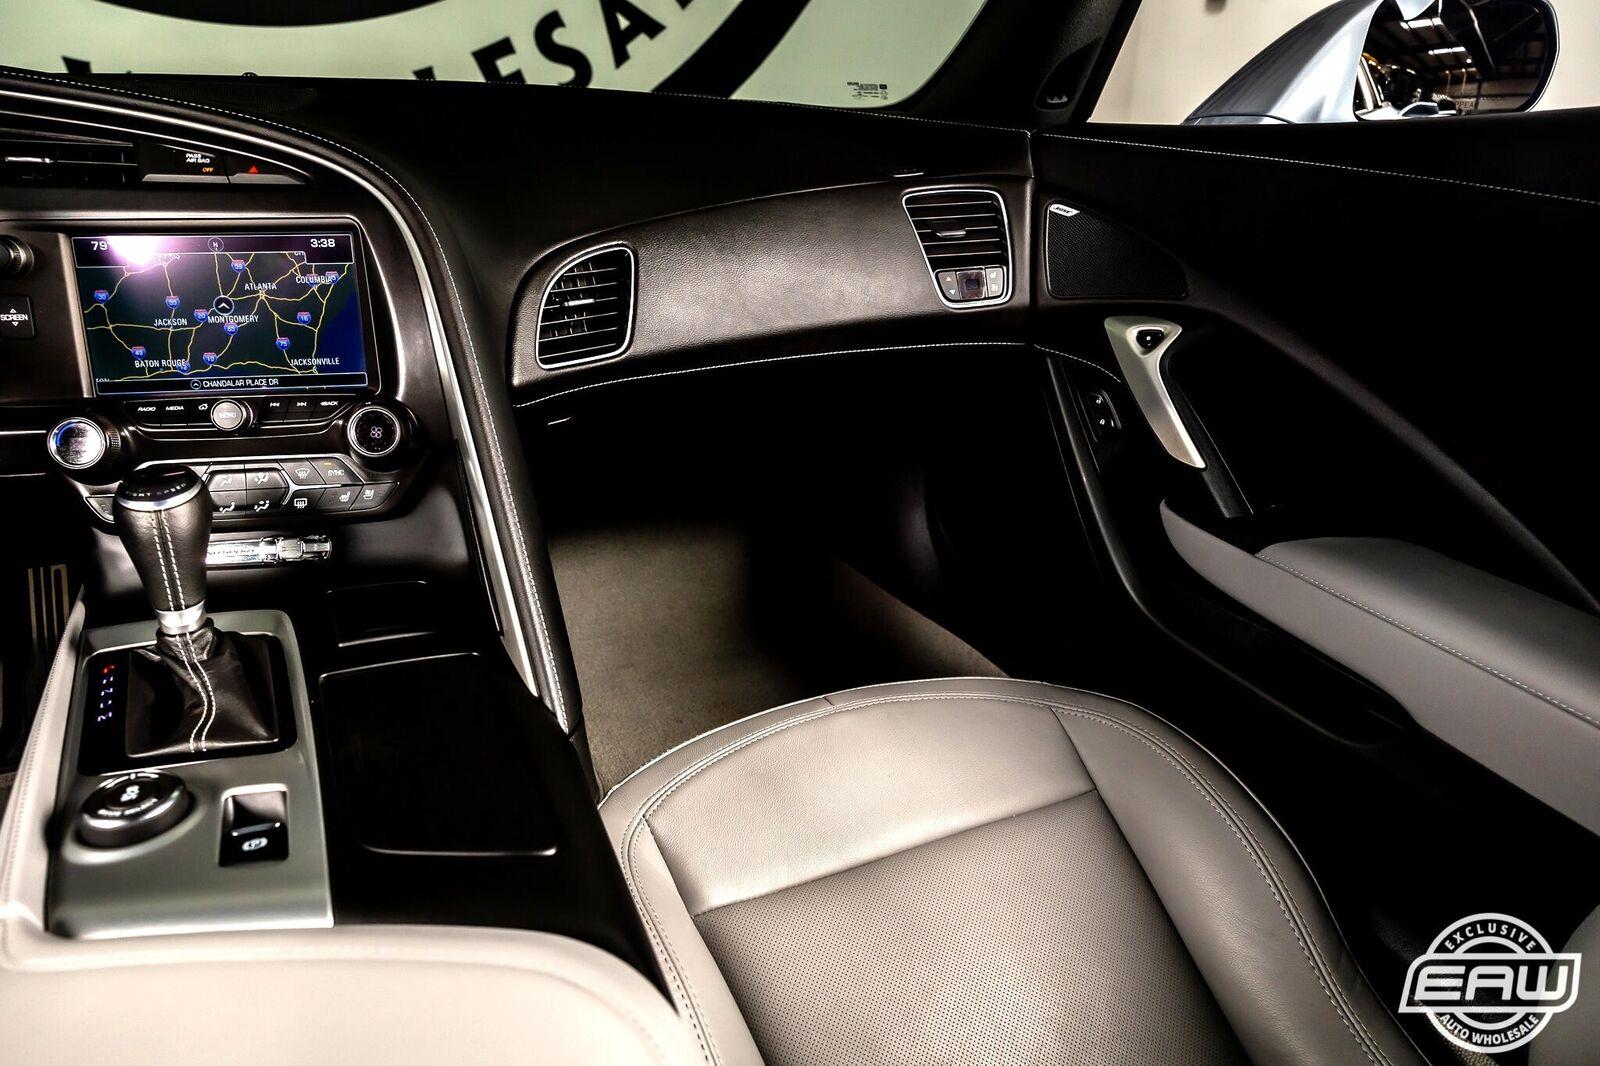 2017 Silver Chevrolet Corvette Grand Sport 2LT | C7 Corvette Photo 8